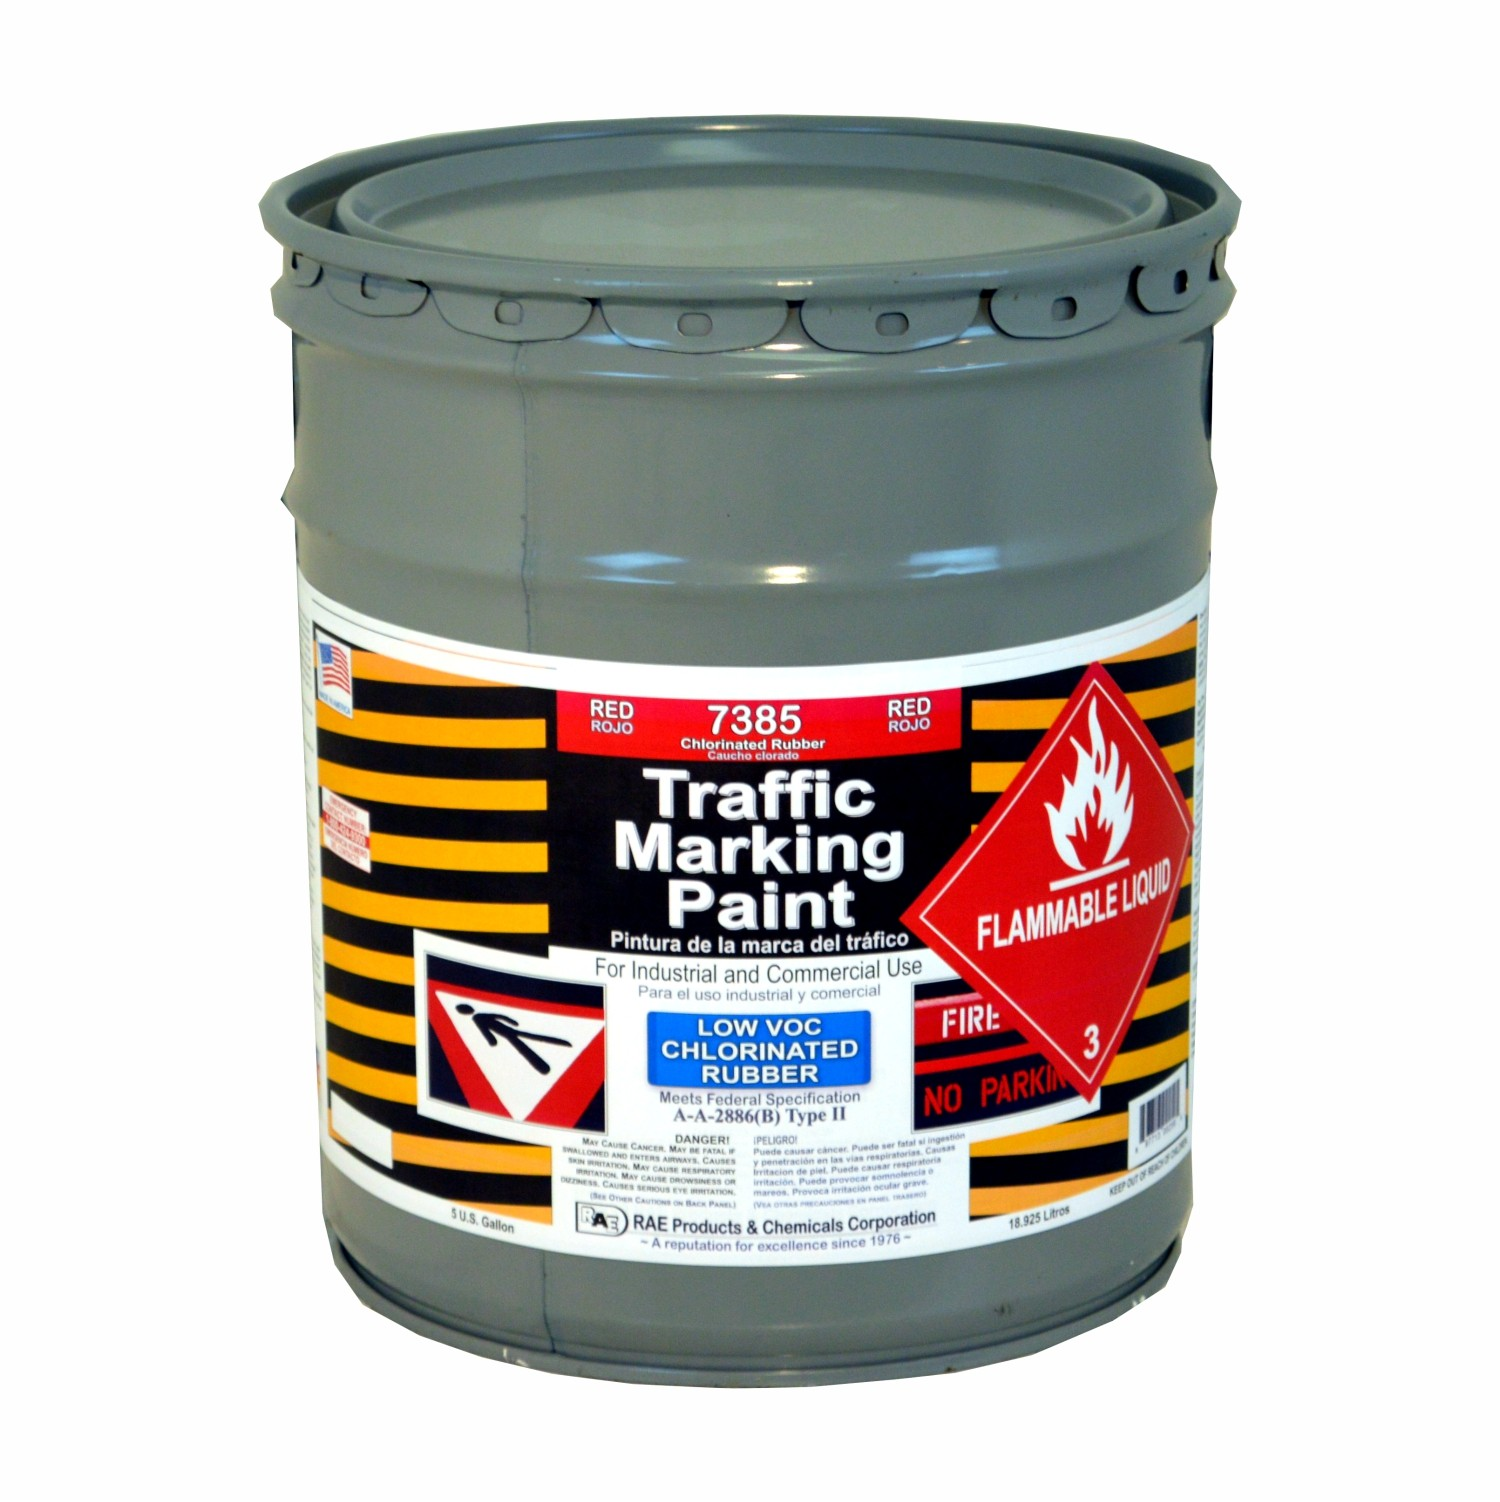 Low Voc Water Based Paint